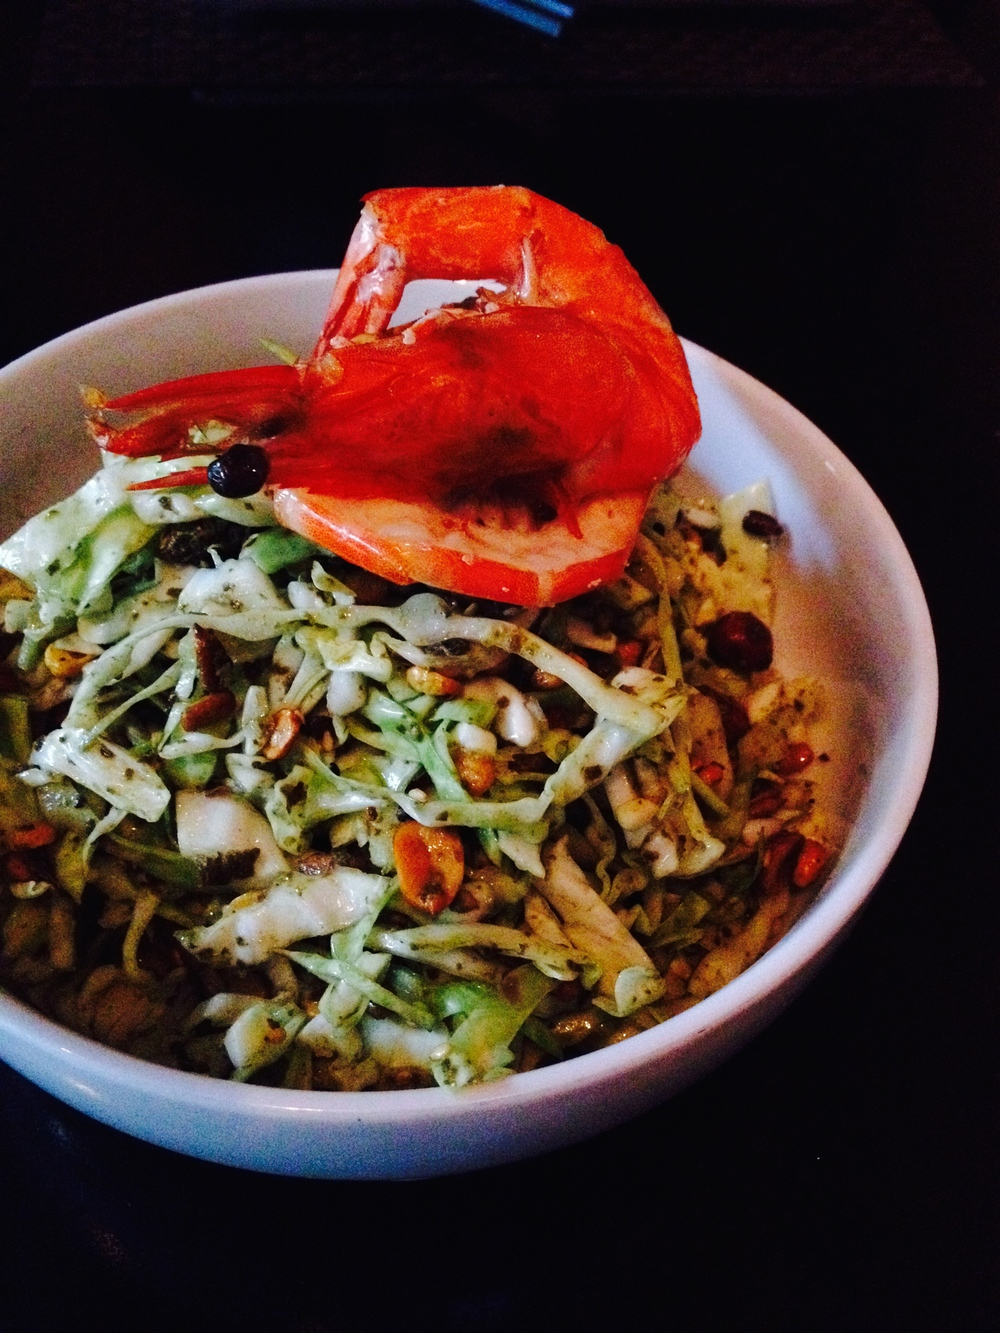 Tea Leaf Salad with cabbage, crispy chana dal, marcona almonds, peanuts, sesame, and prawns.